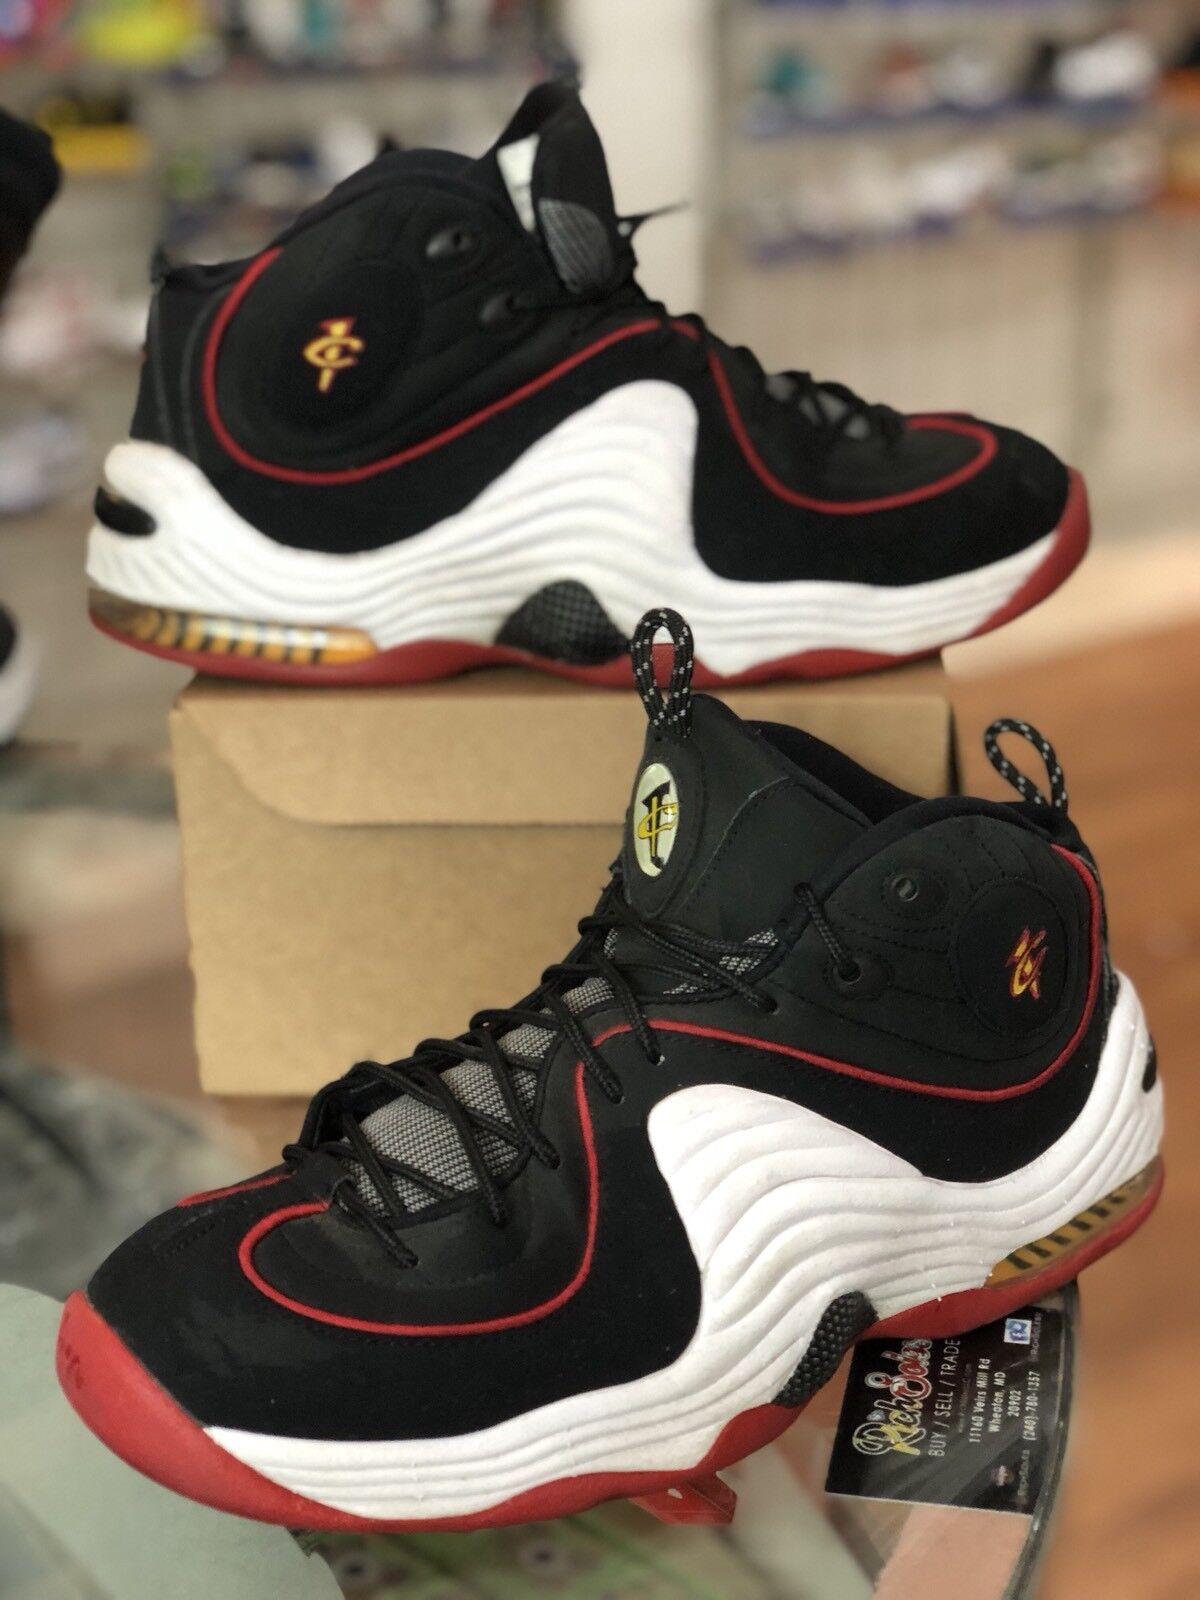 Nike Air Penny II 2 Miami Heat Hardaway Black Mens Shoes Size 10.5 333886-002